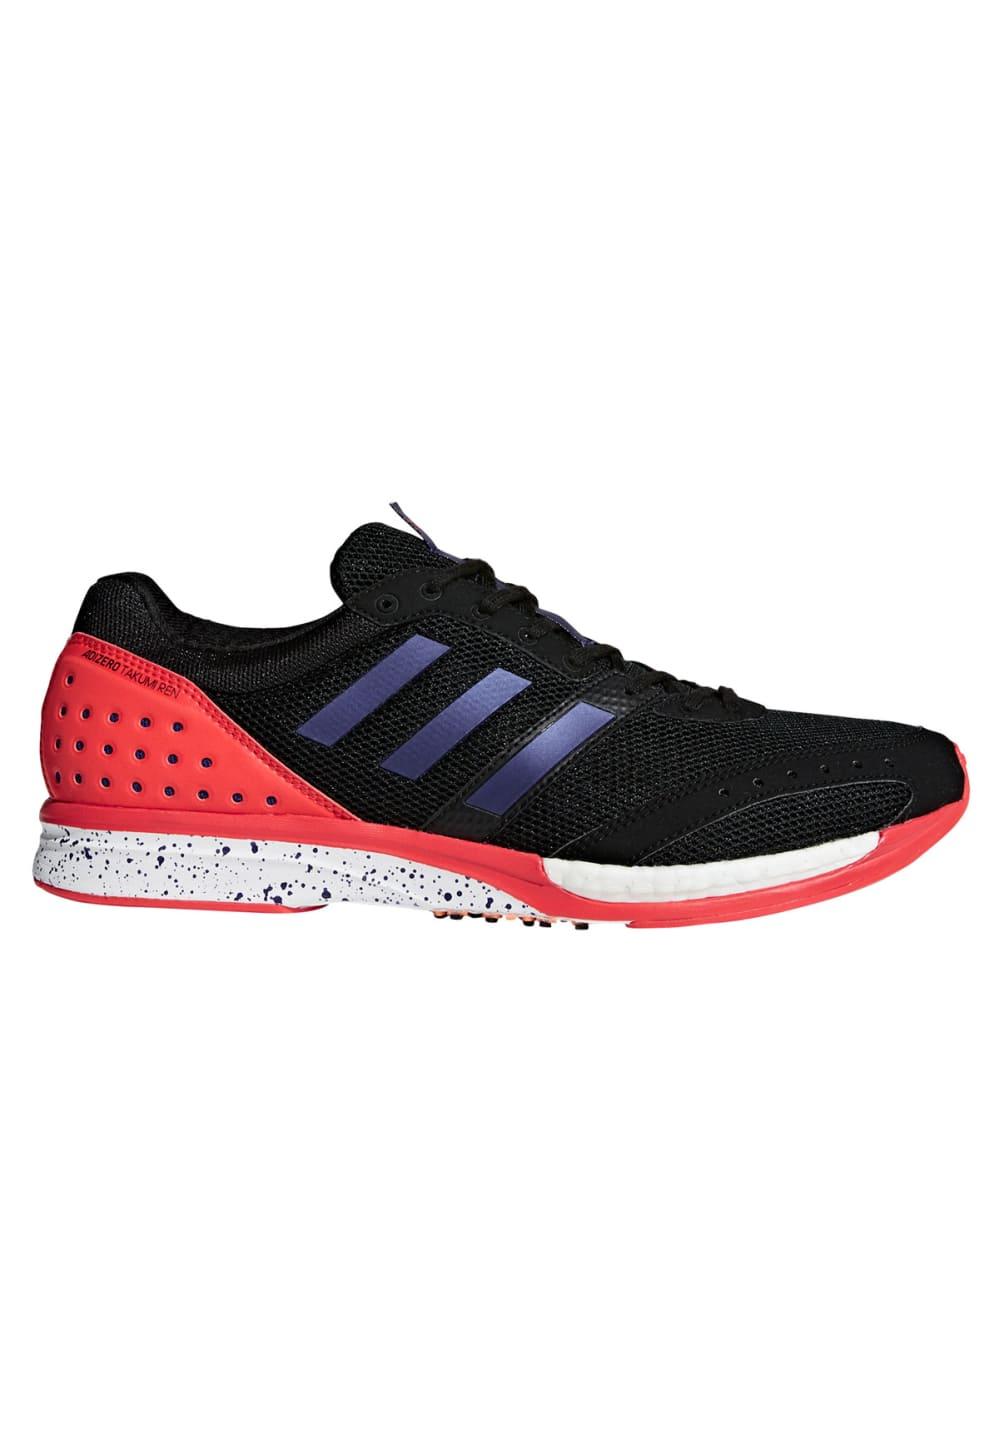 3 Running Homme Takumi Chaussures Adidas Pour Ren Noir Adizero mOw8yvNn0